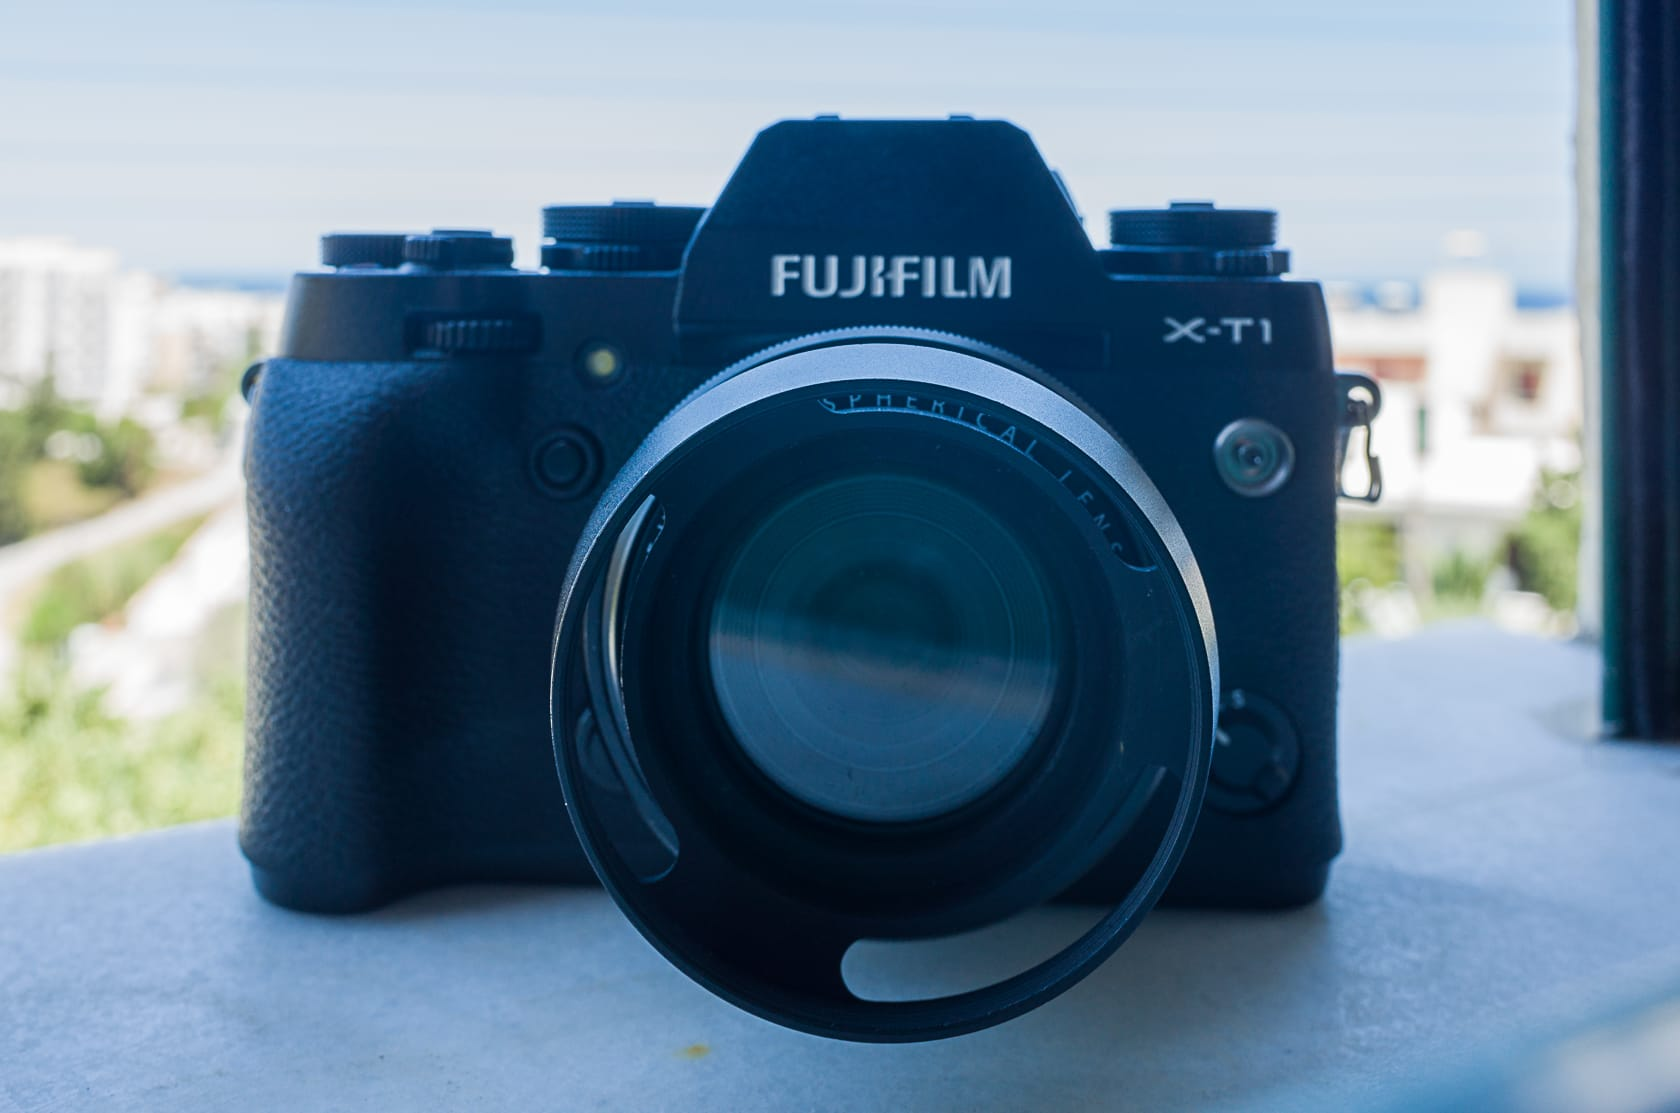 Fujifilm X-T1 for Street Photography